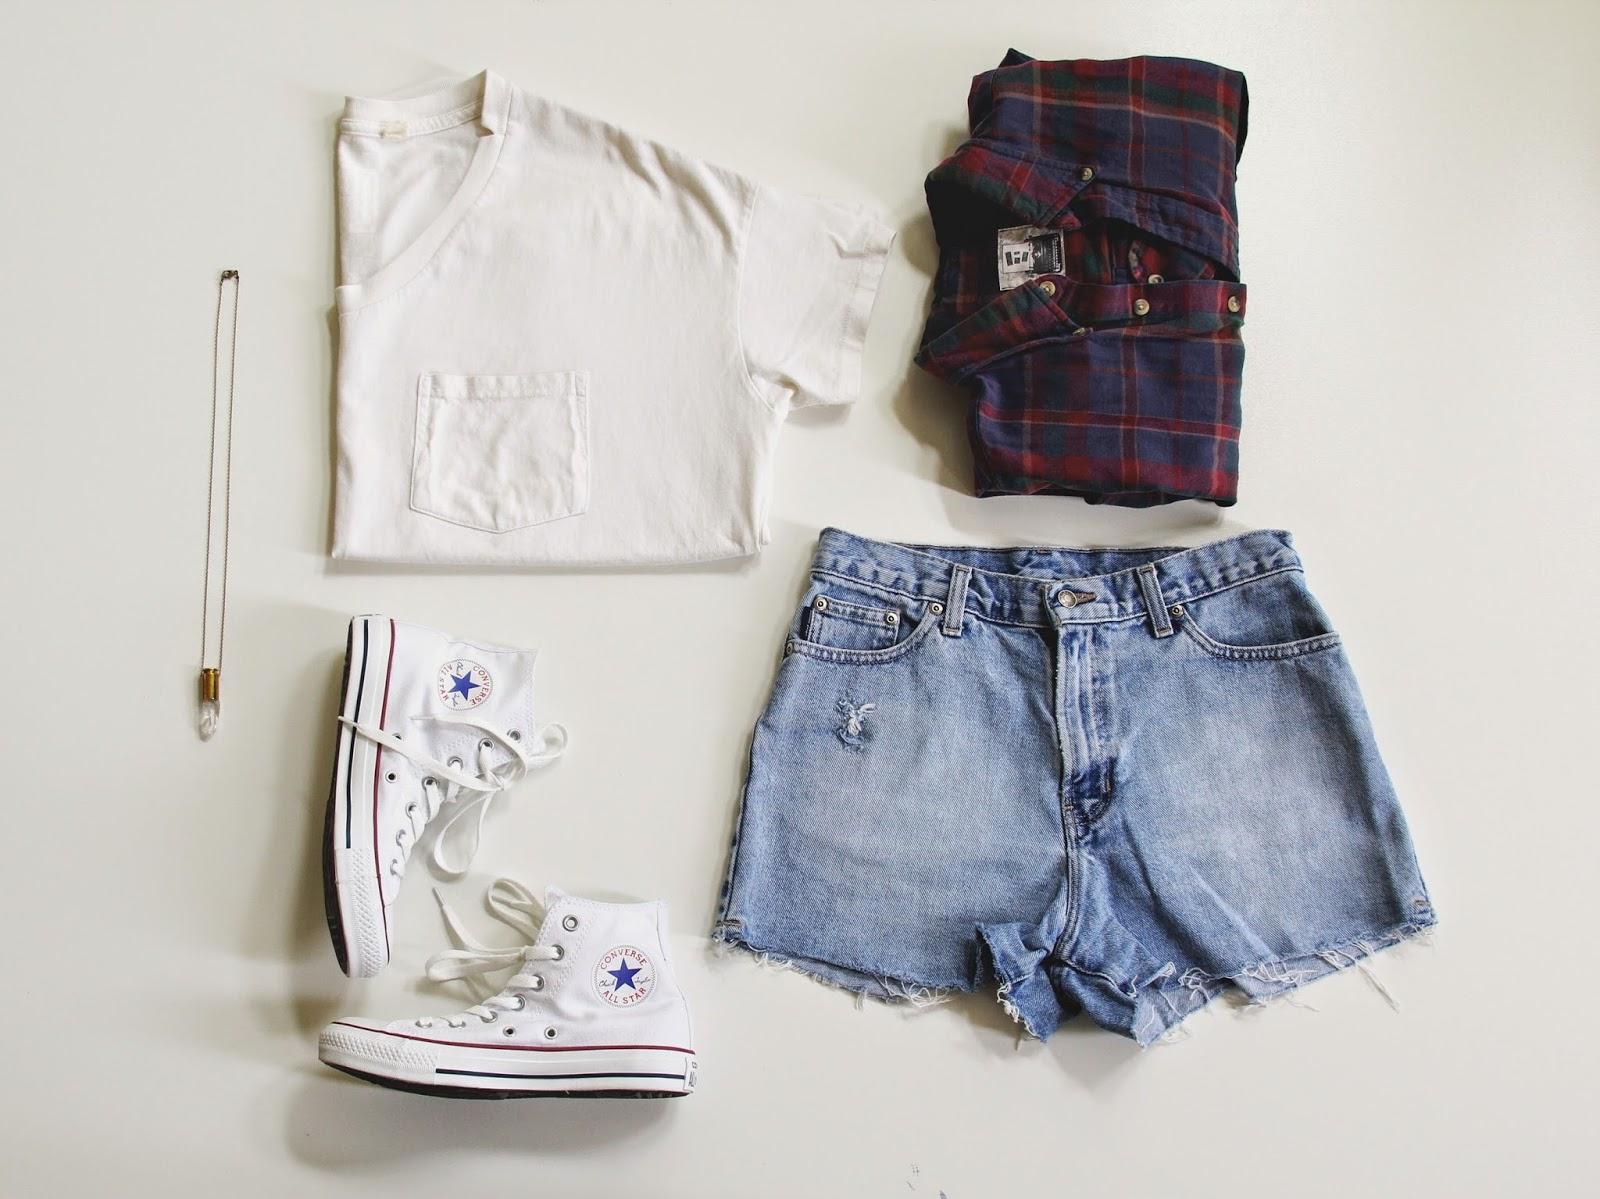 Flannel, Crystal Bullet, Vintage Denim Shorts, Converse, White T-shirt